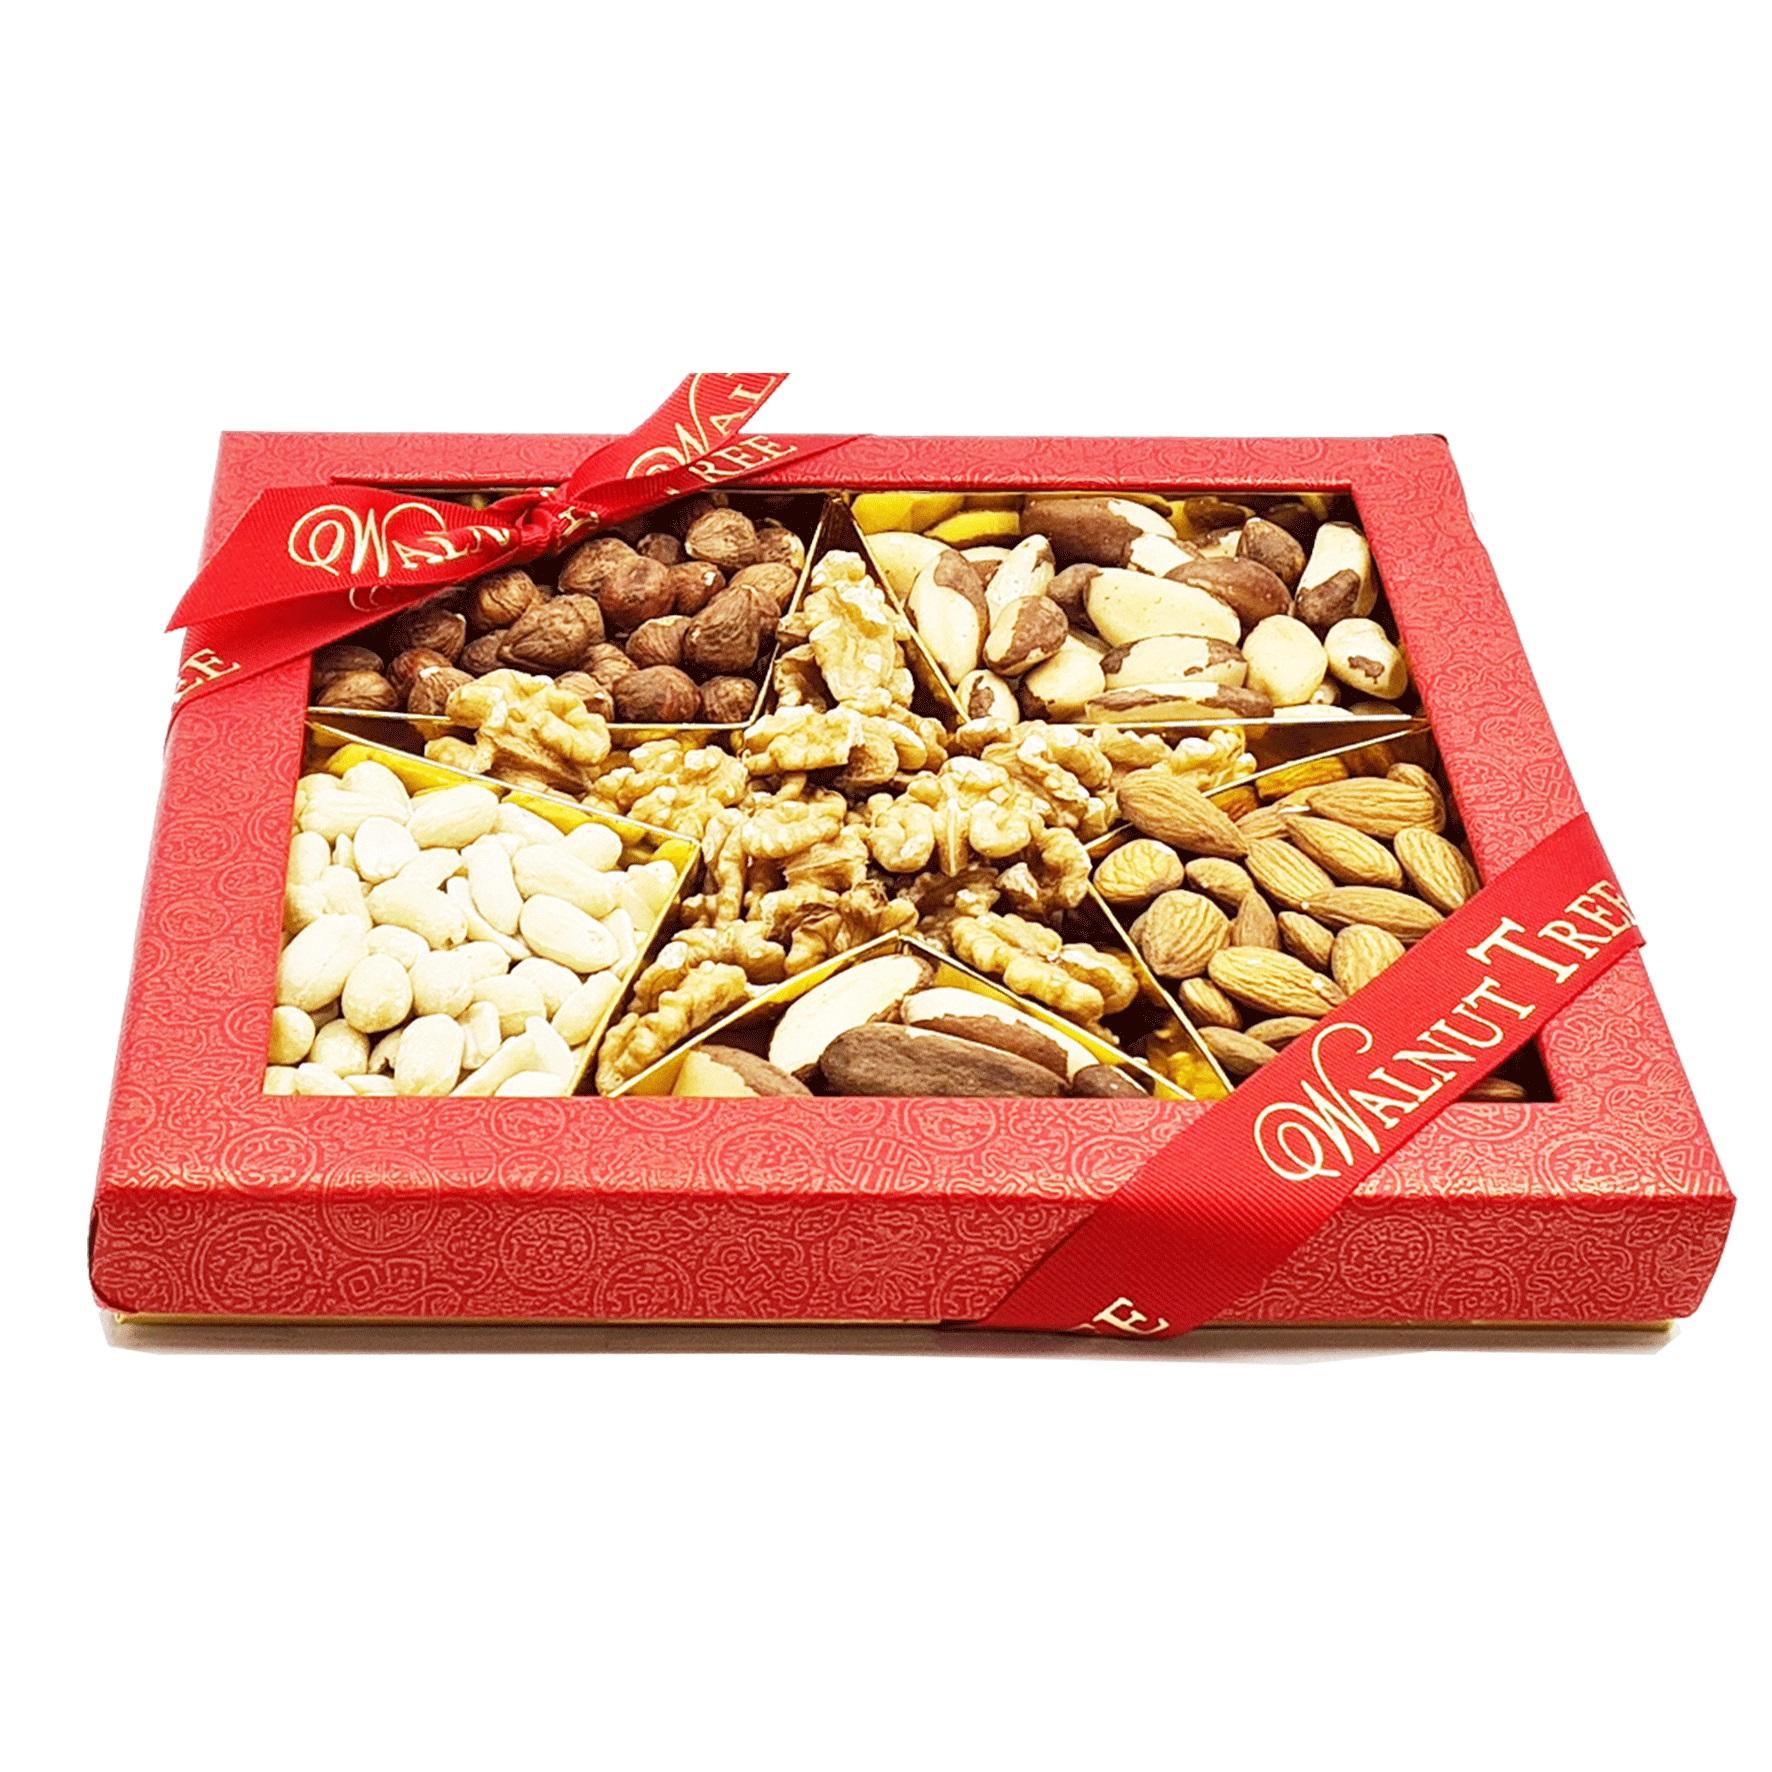 Walnut Tree Star Nut Selection Box